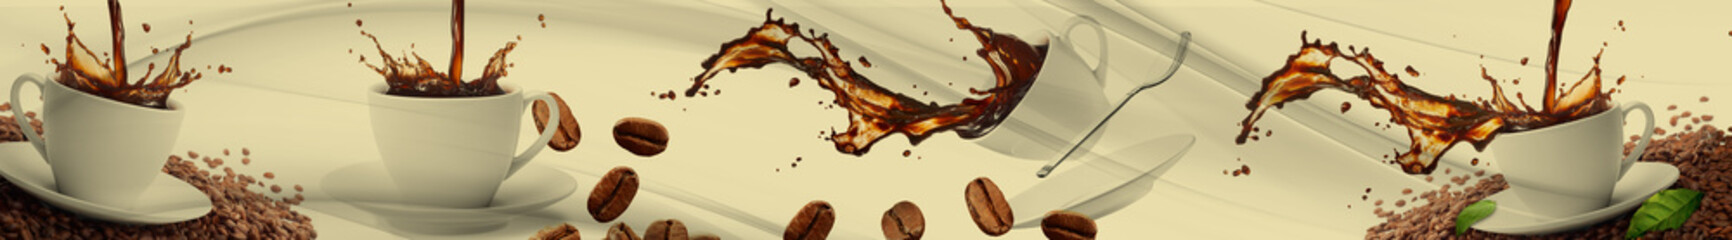 abstract coffe   abstrakcyjna kawa